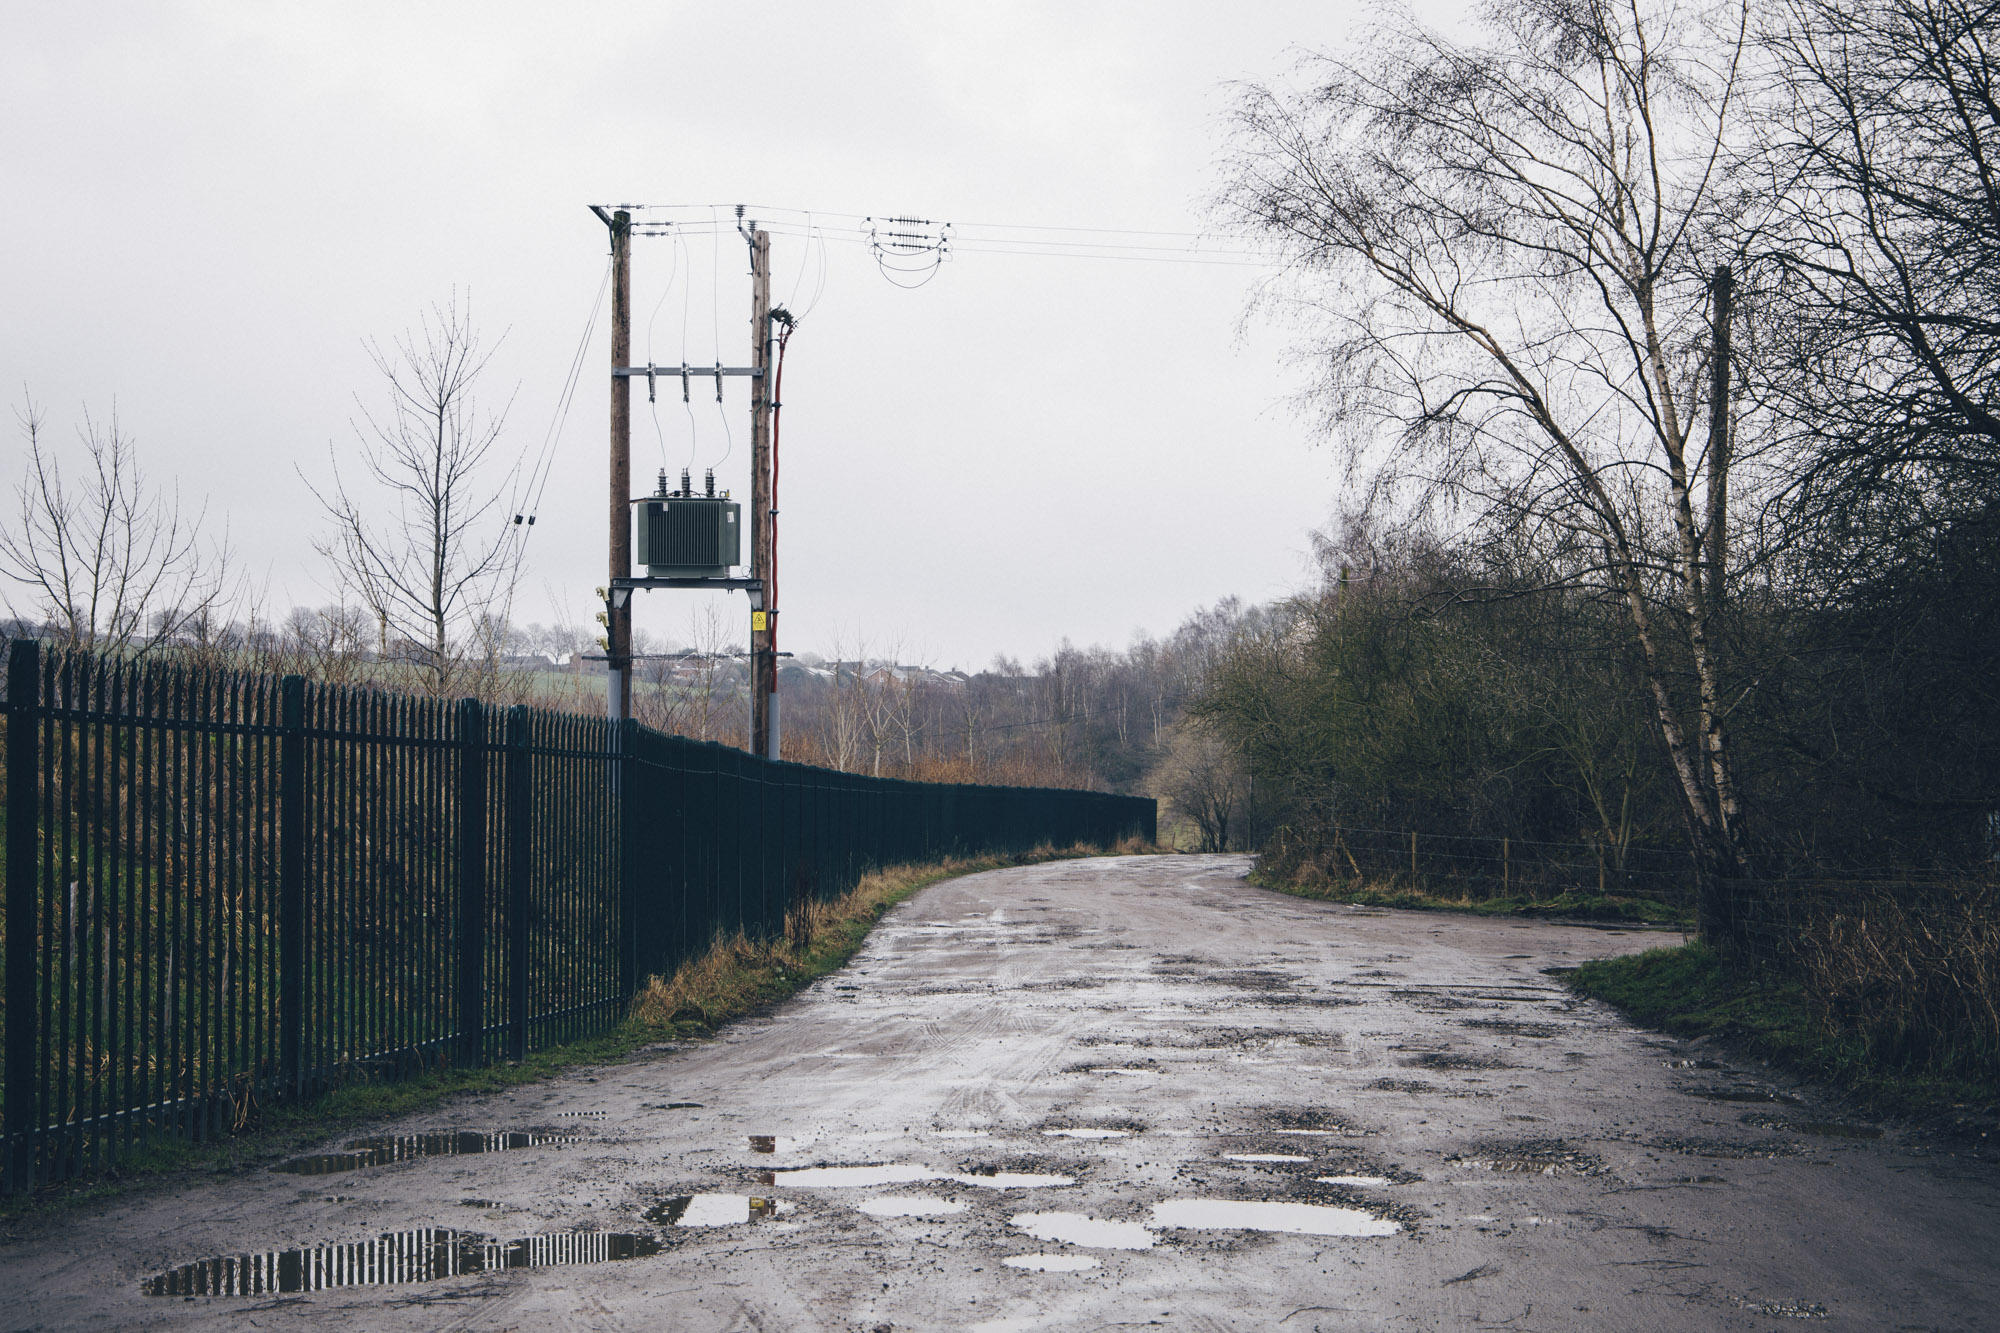 Alistair Grimley - Apedale 8147 - © Copy